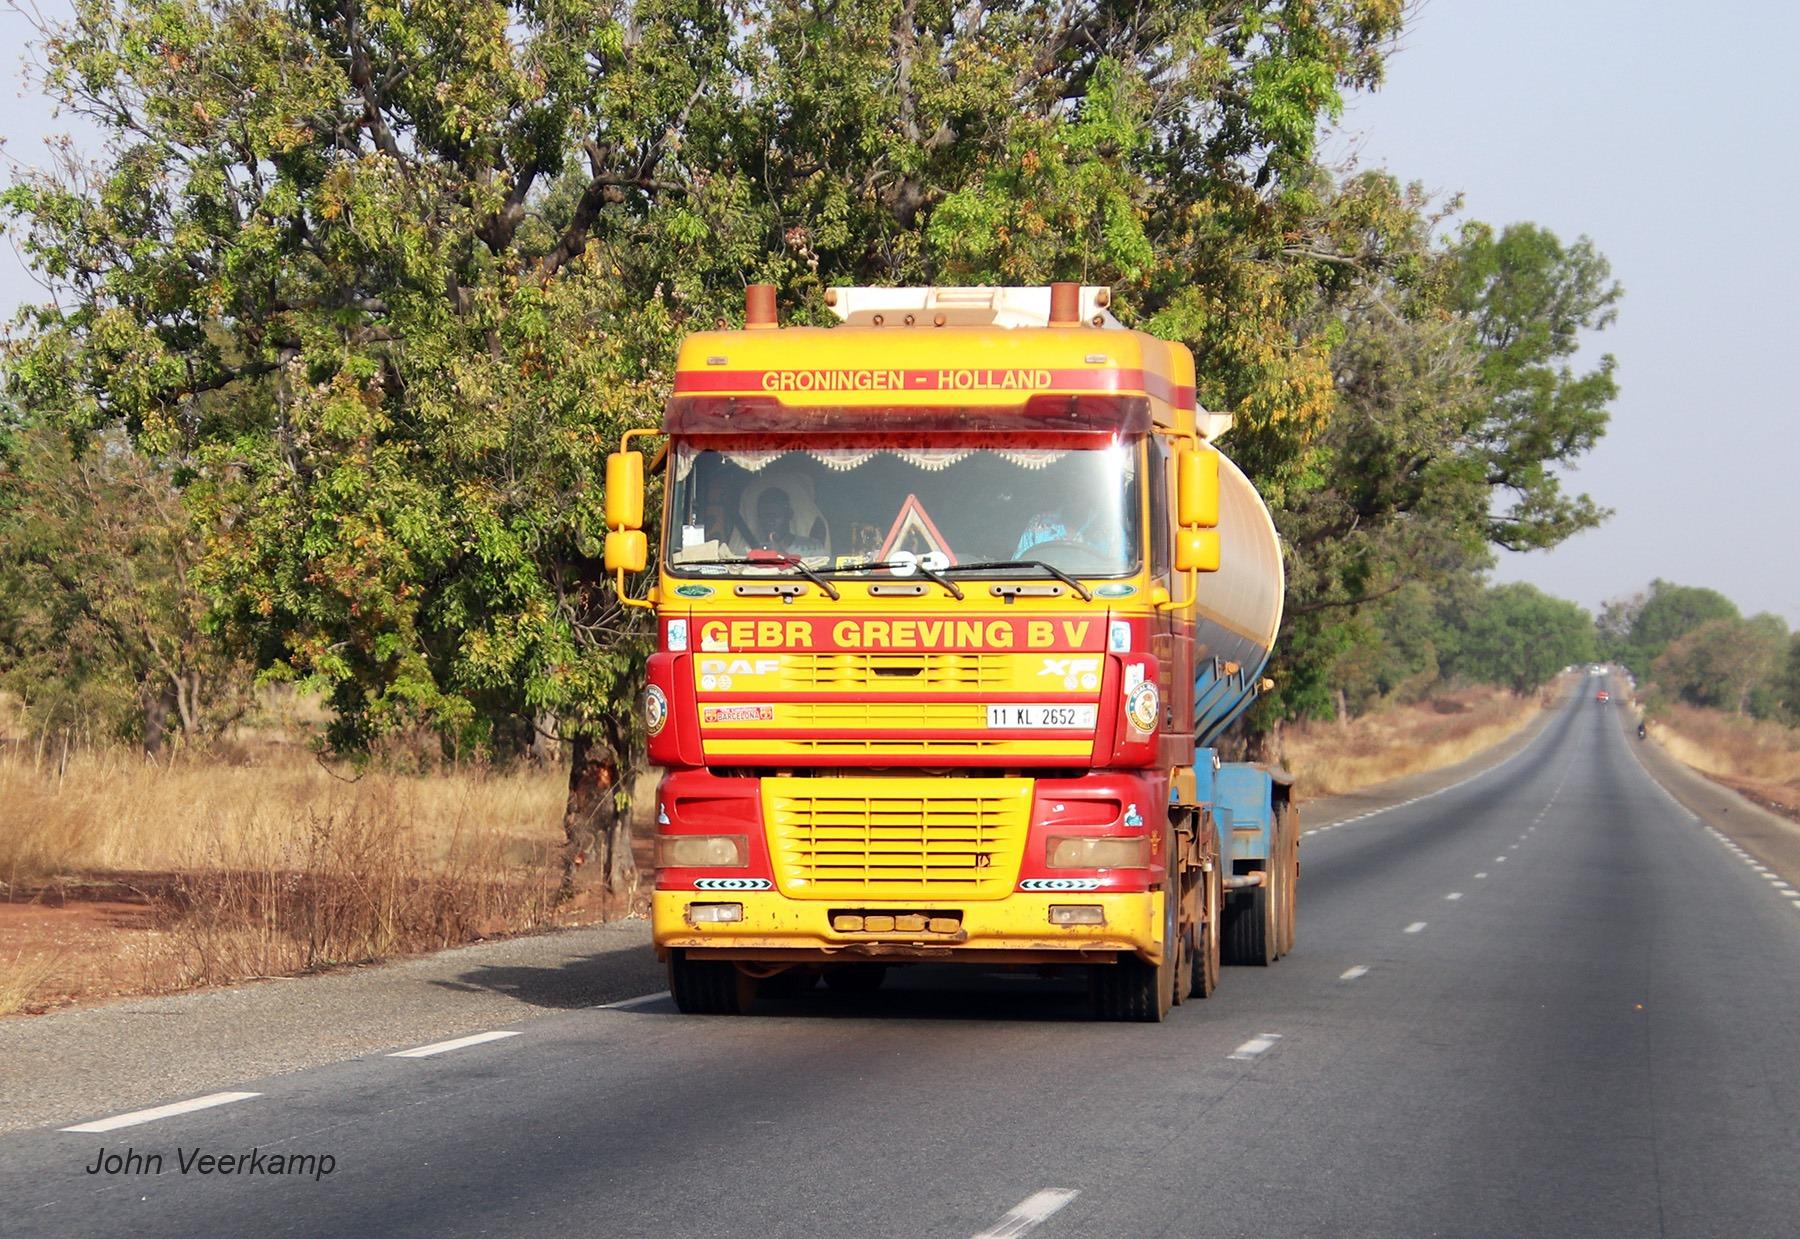 onderweg-van-Ouagadougou-naar-Bobo-Dialasso--Burkina-Faso-19-02-2020-John-Veerkamp-foto-